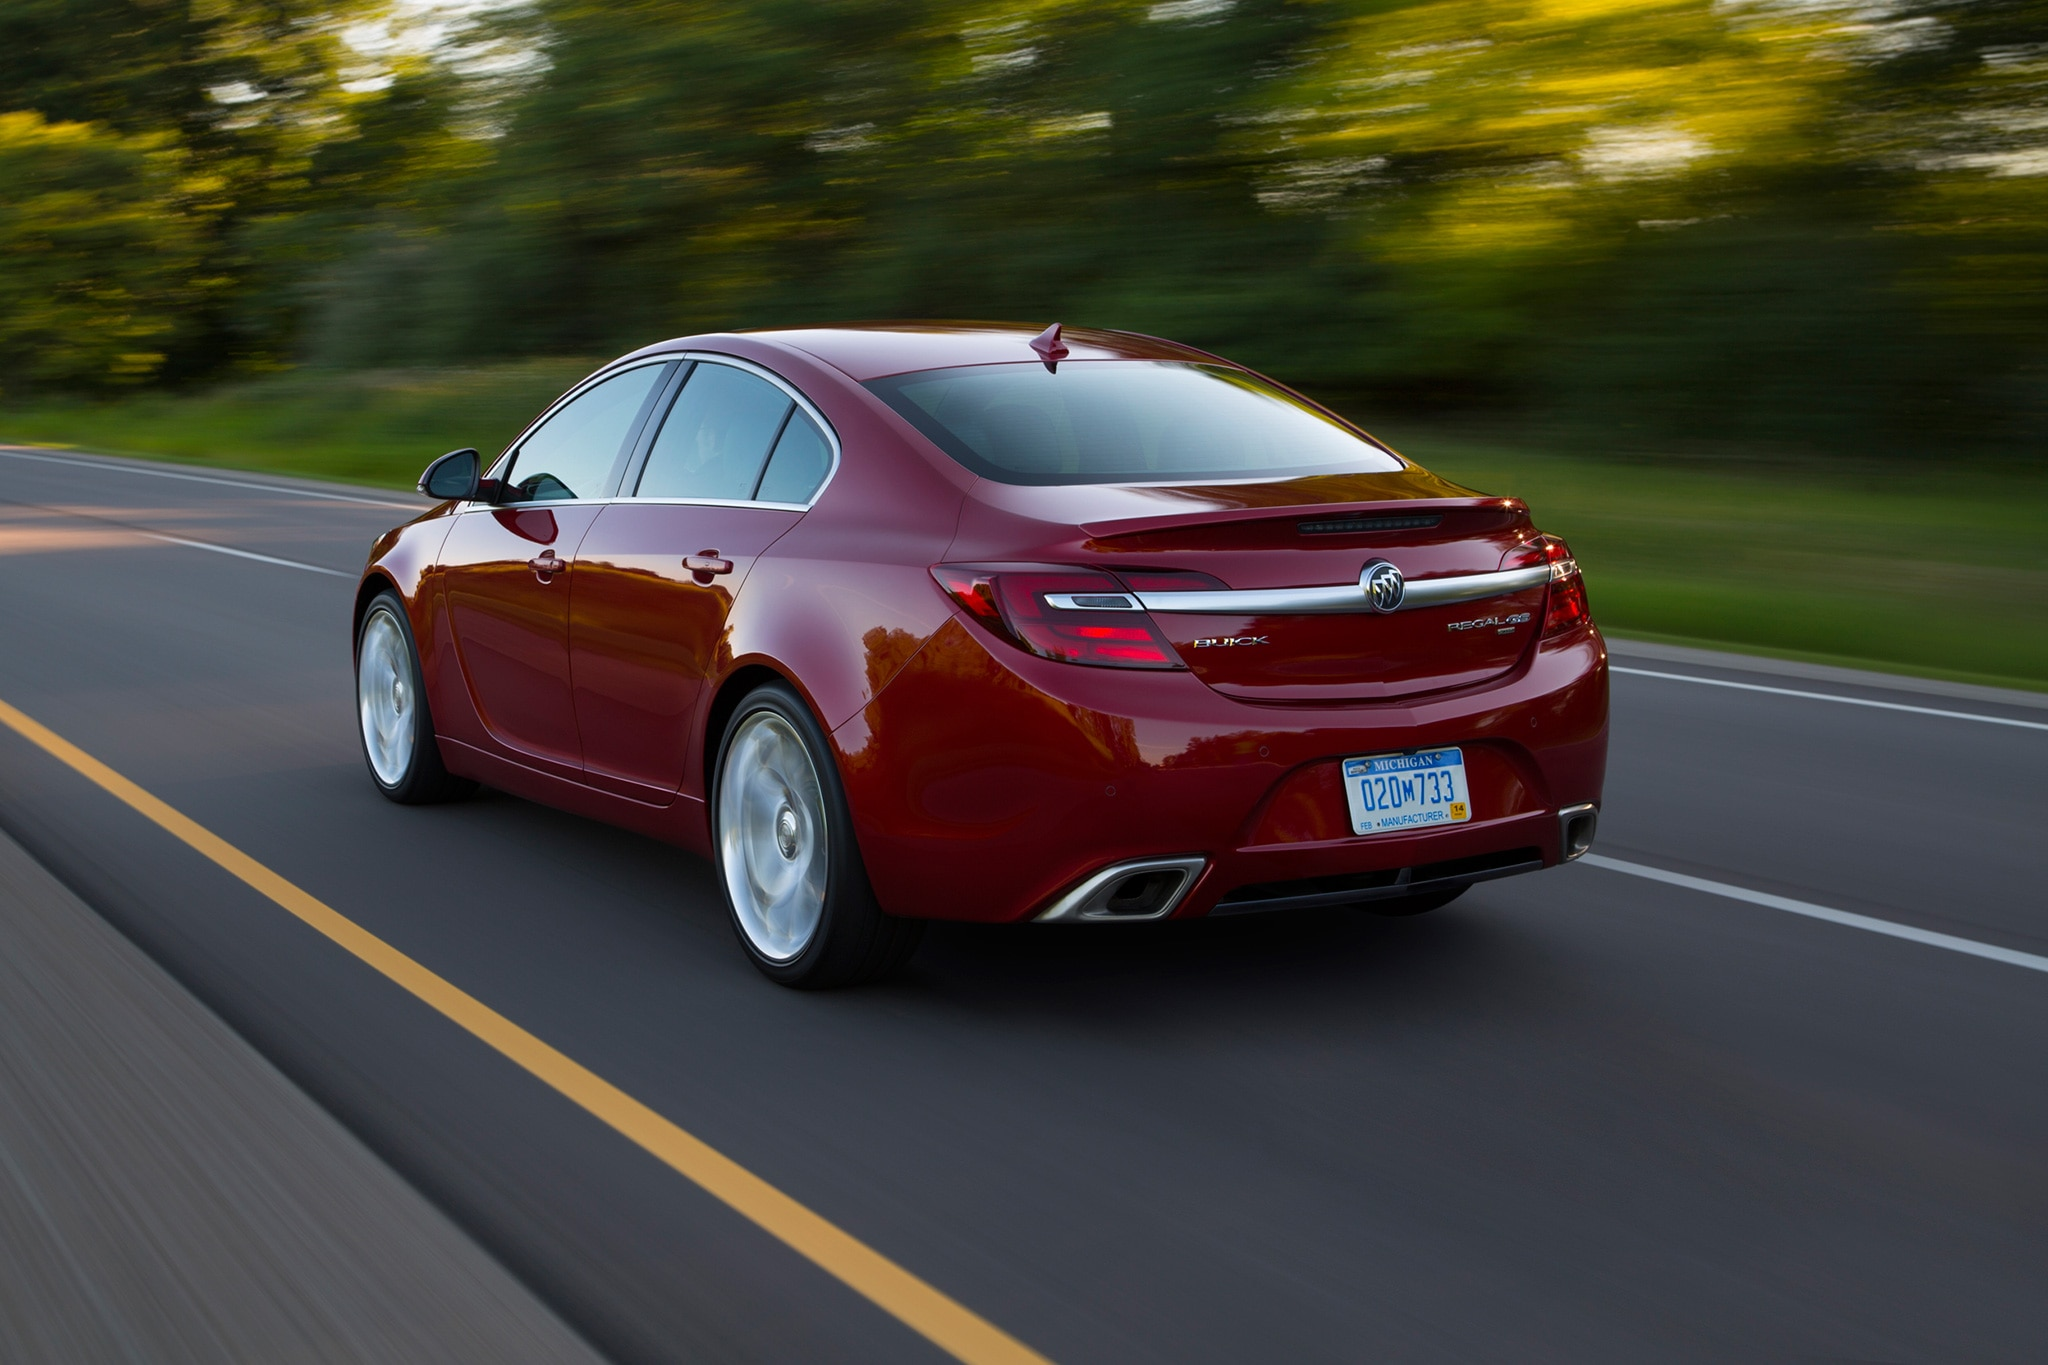 2017 Buick Regal GS Rear Three Quarter In Motion